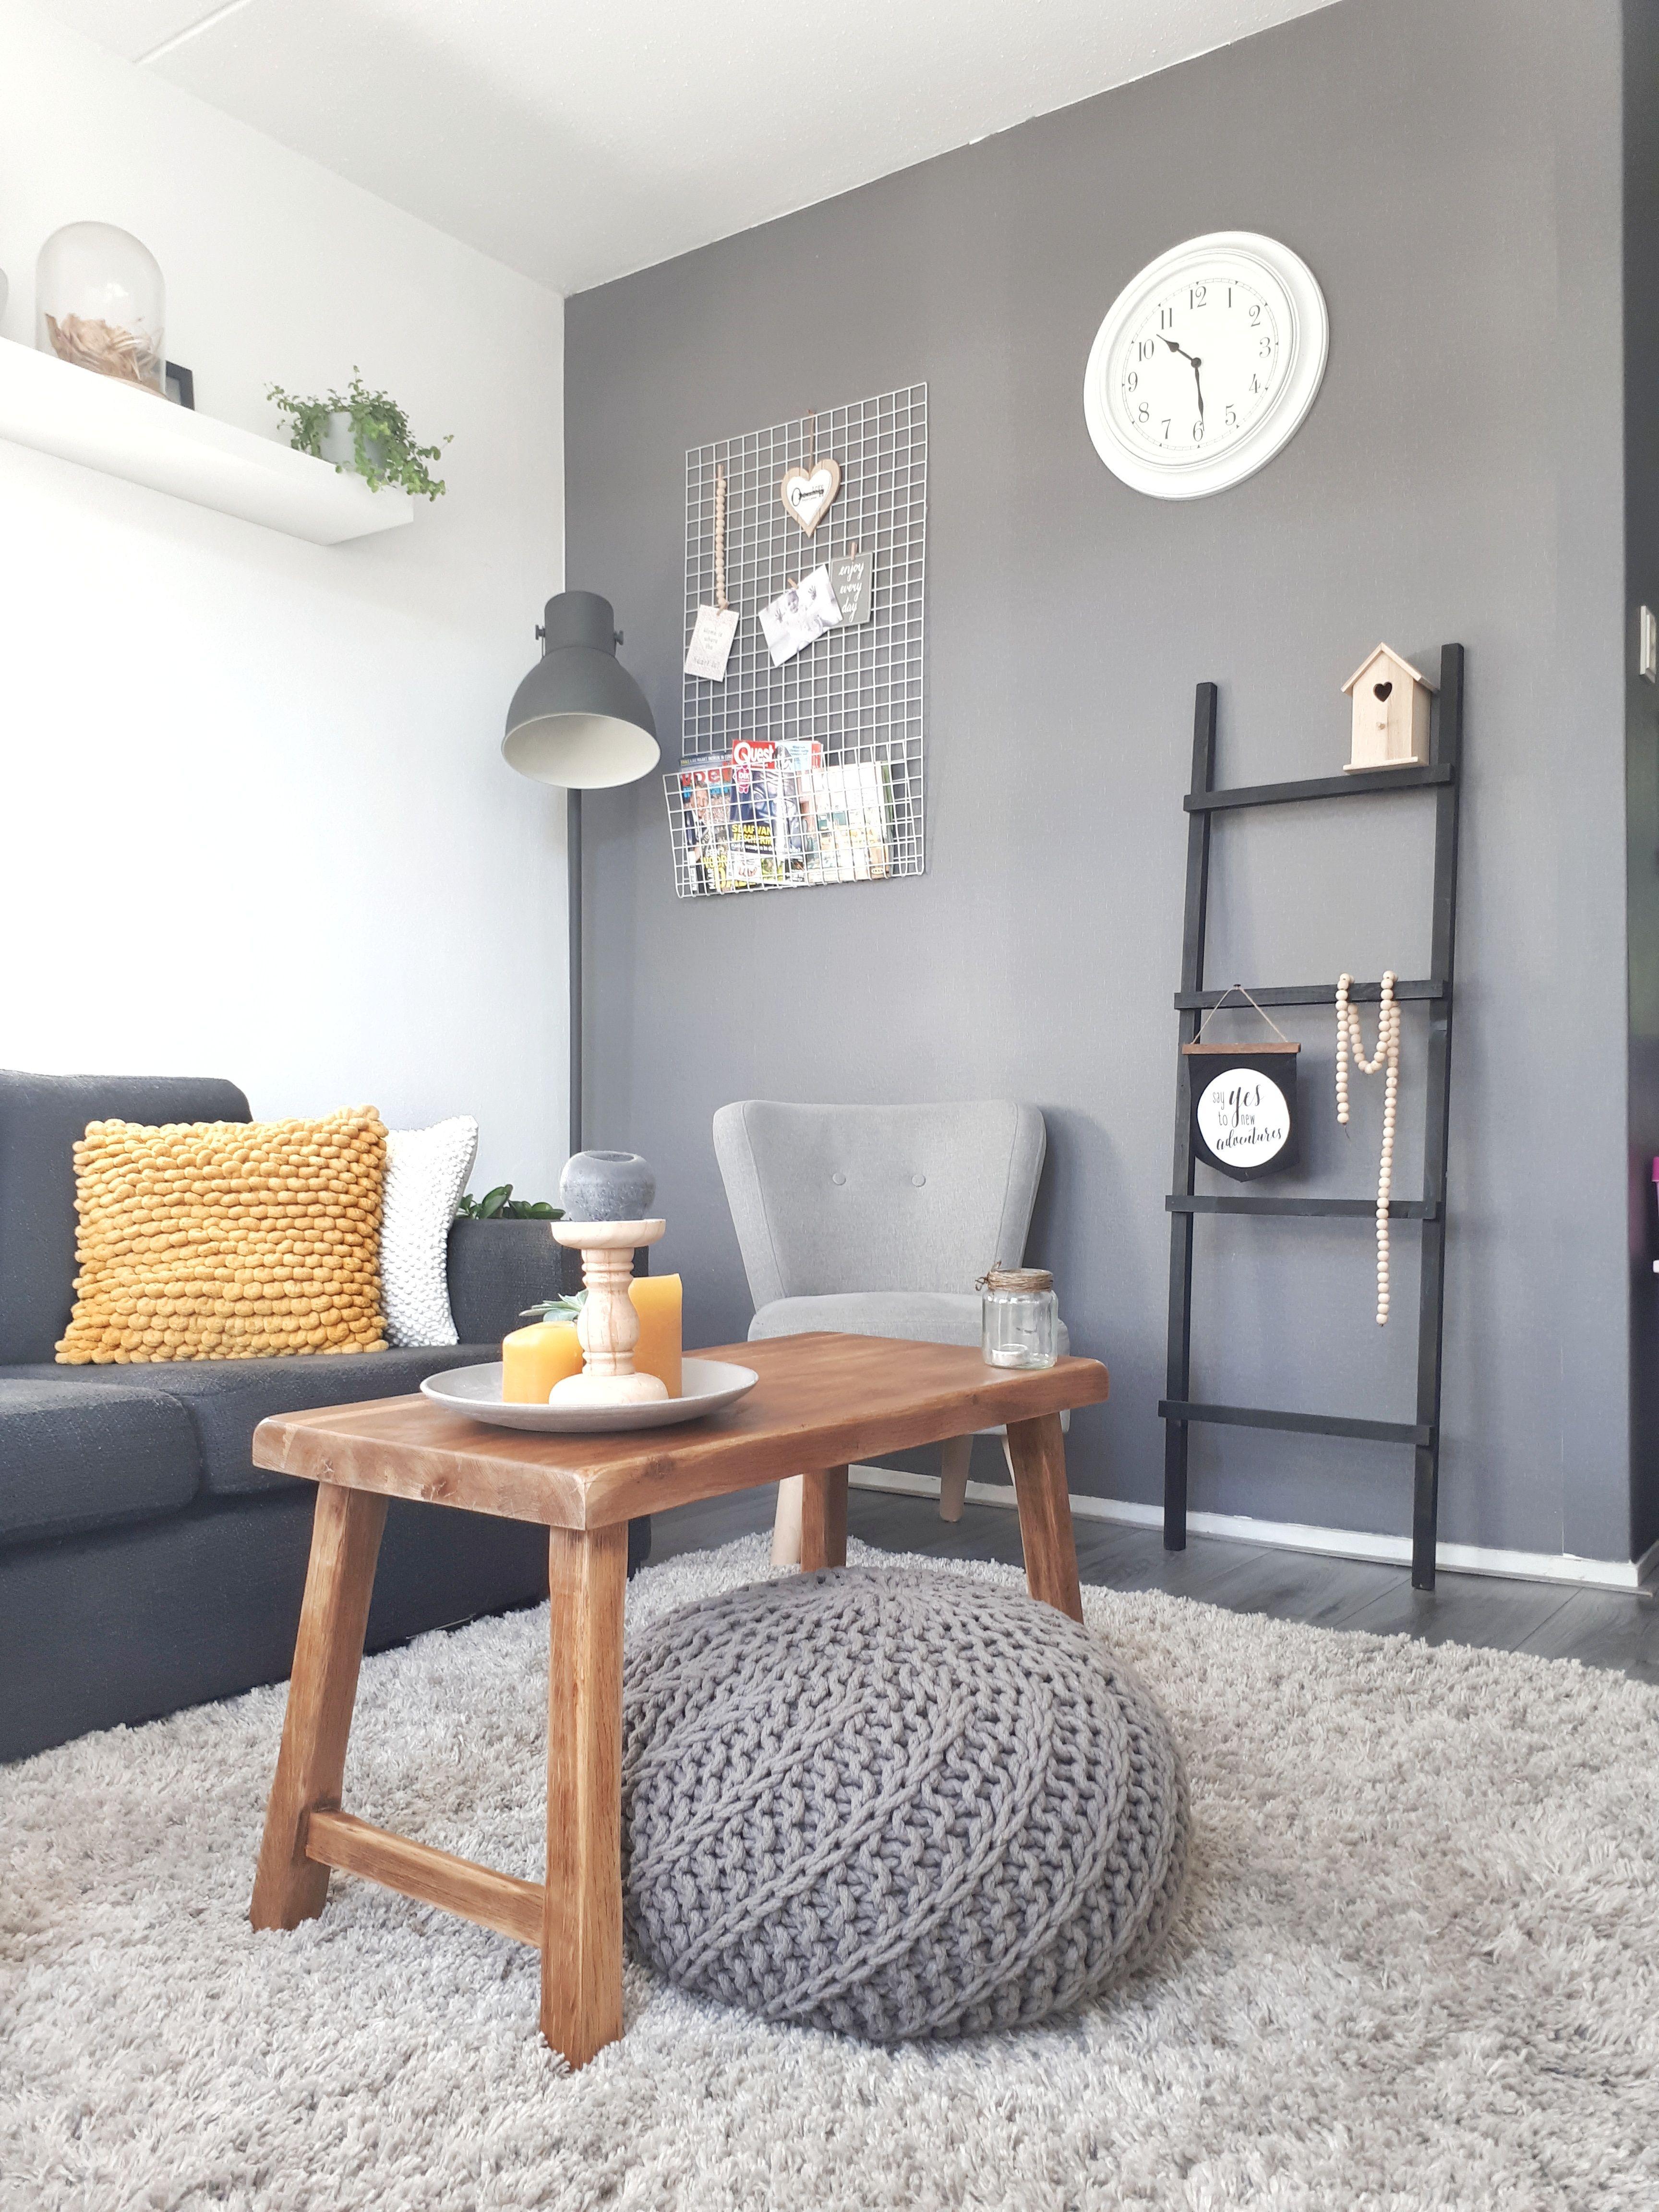 Small room - repair ideas